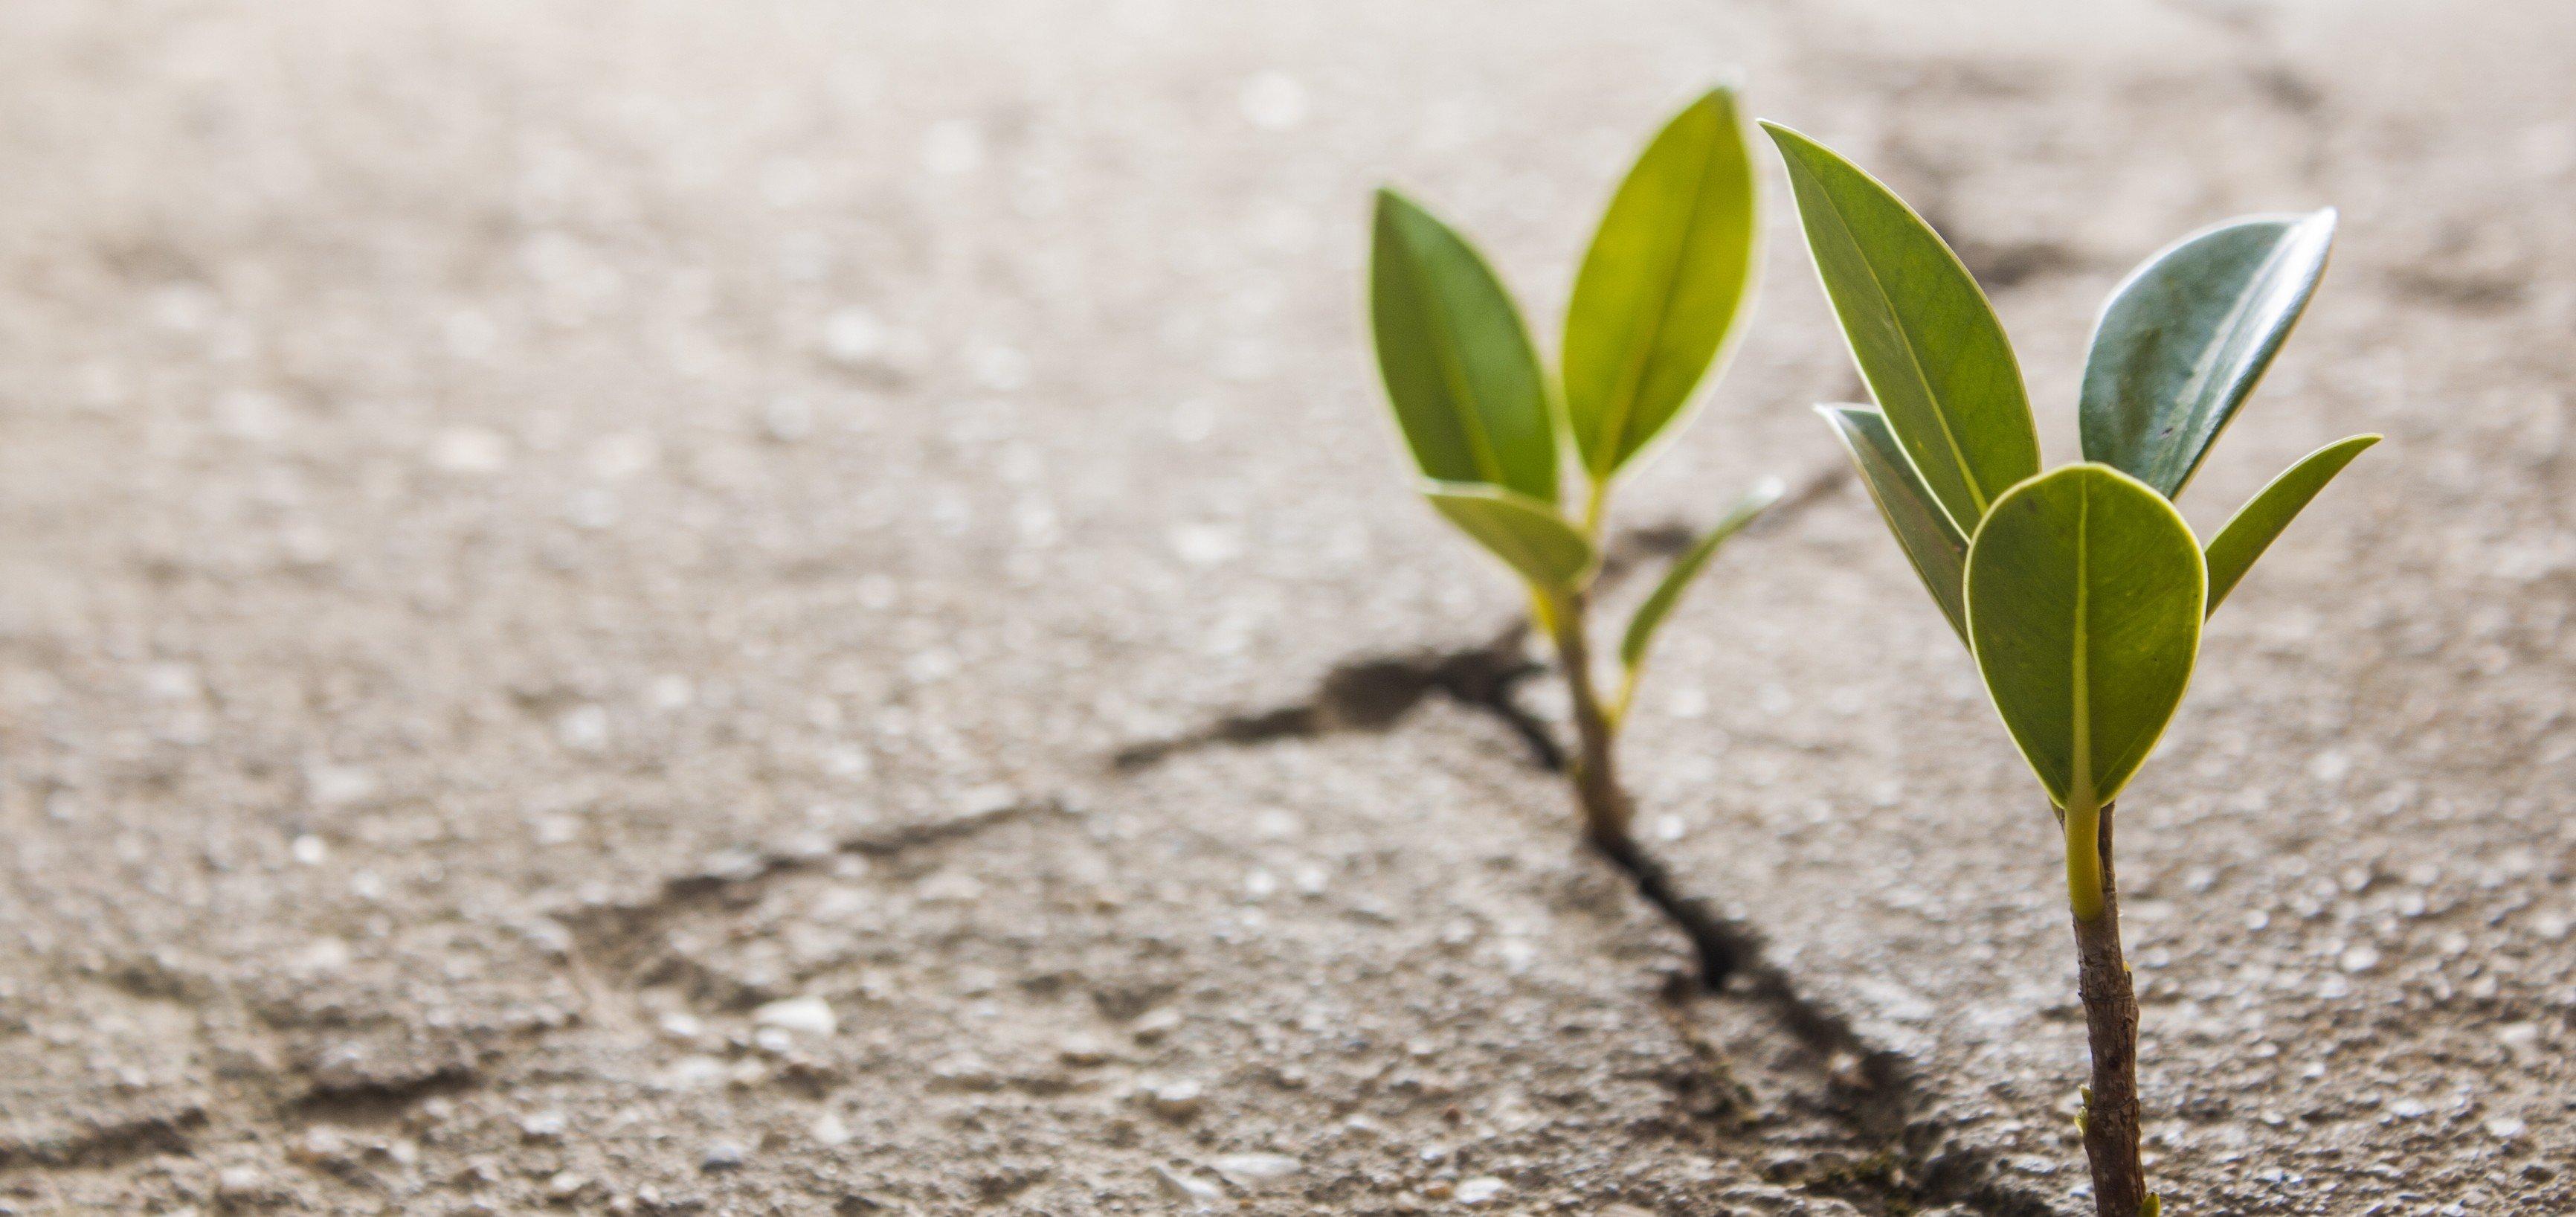 rosh hashanah torahfortheresistance cultivating hope jewschool